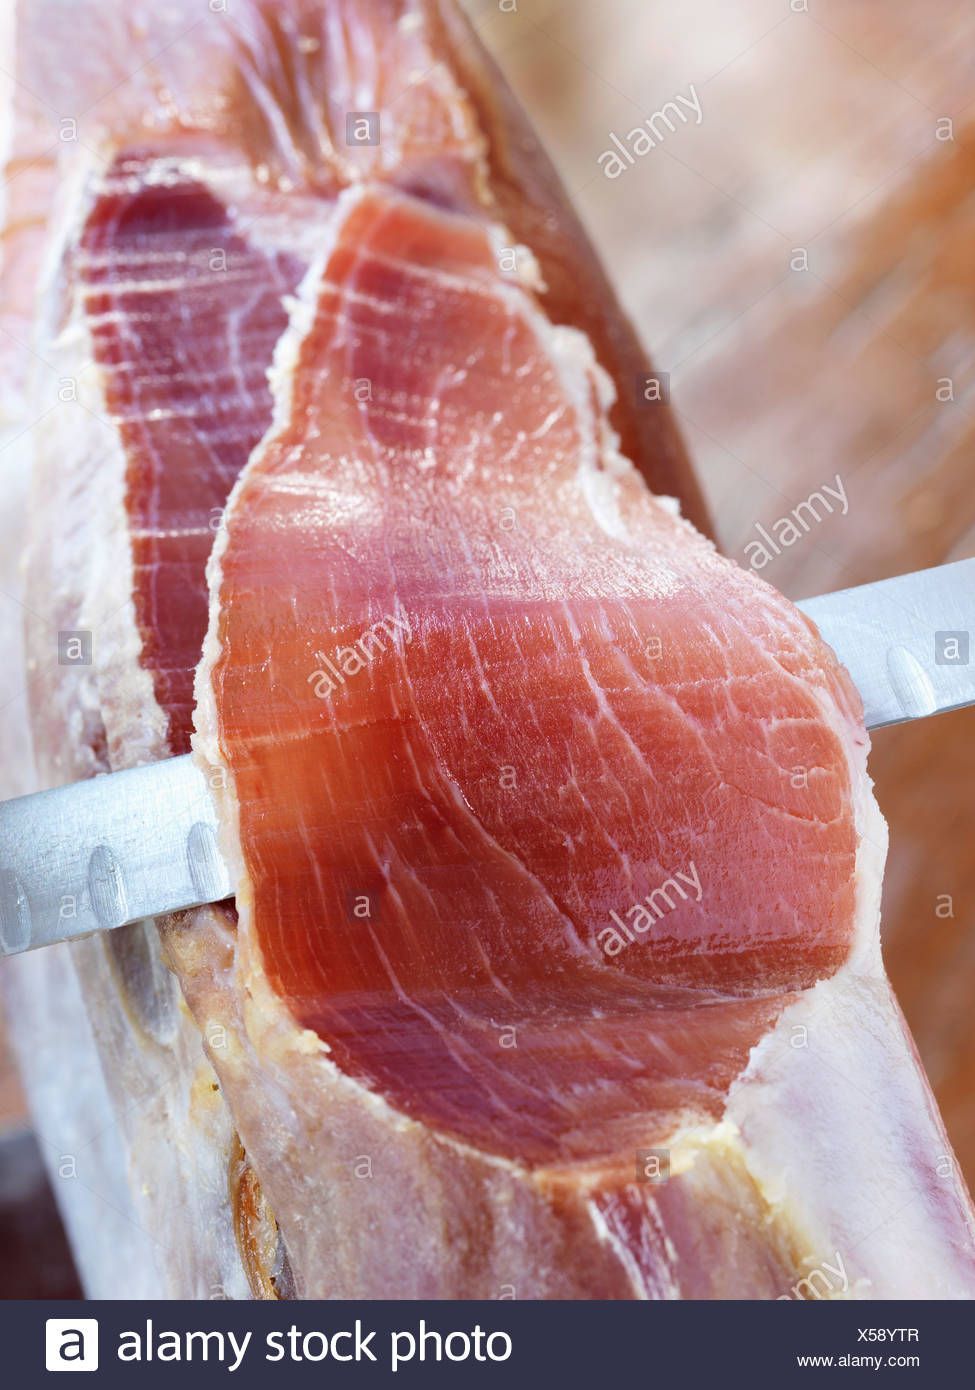 Carving a Serrano ham - Stock Image